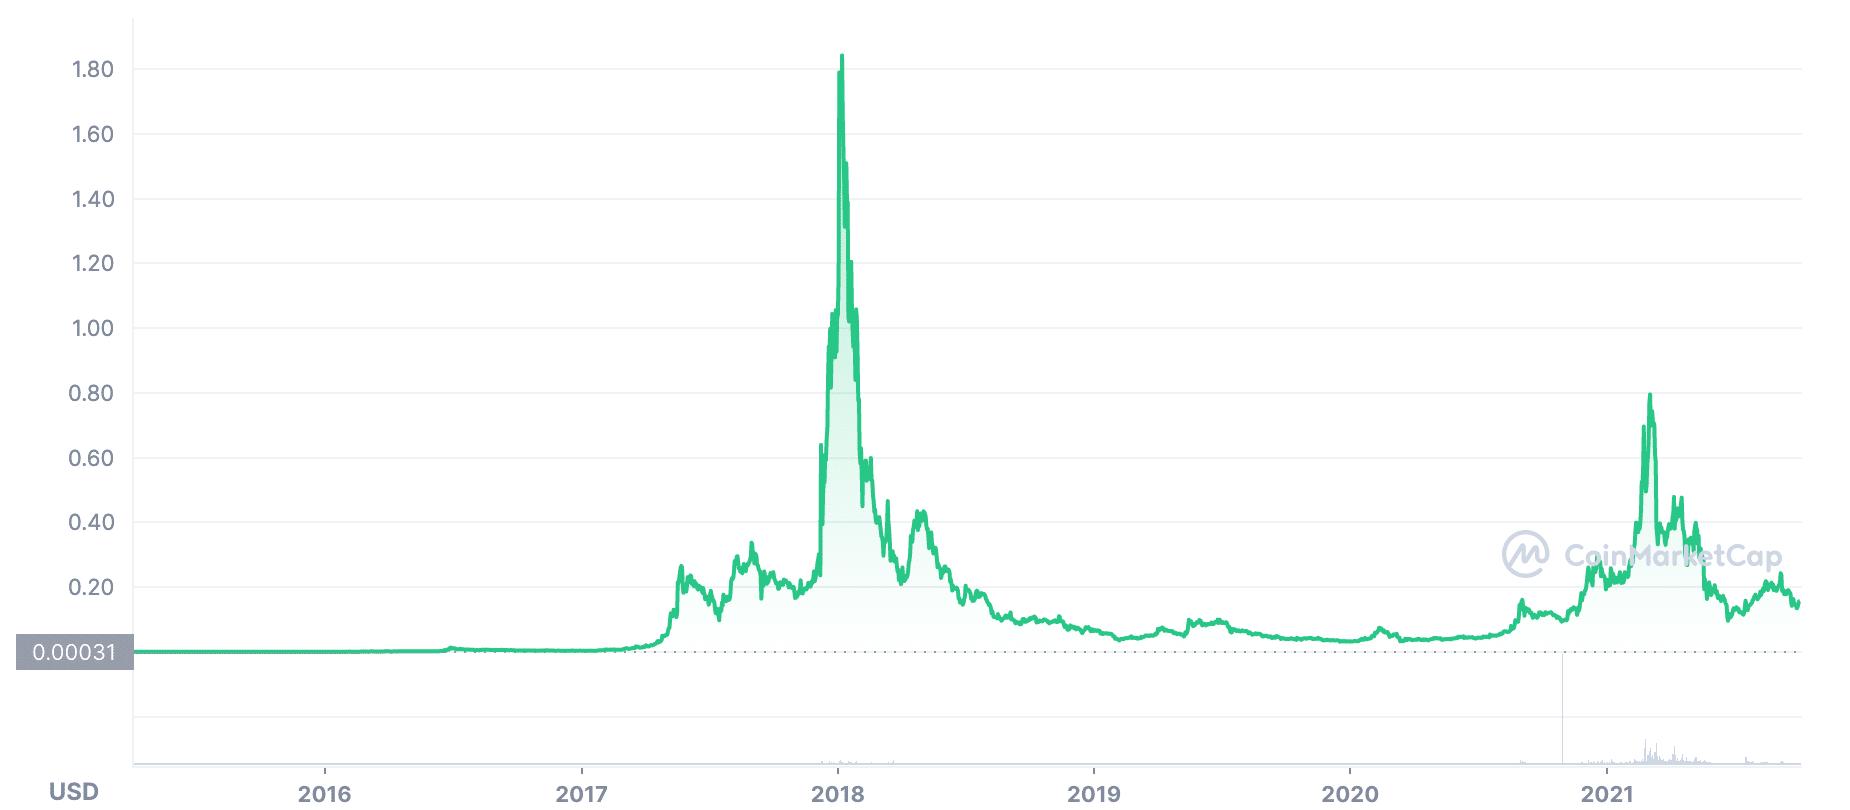 XEM token price chart